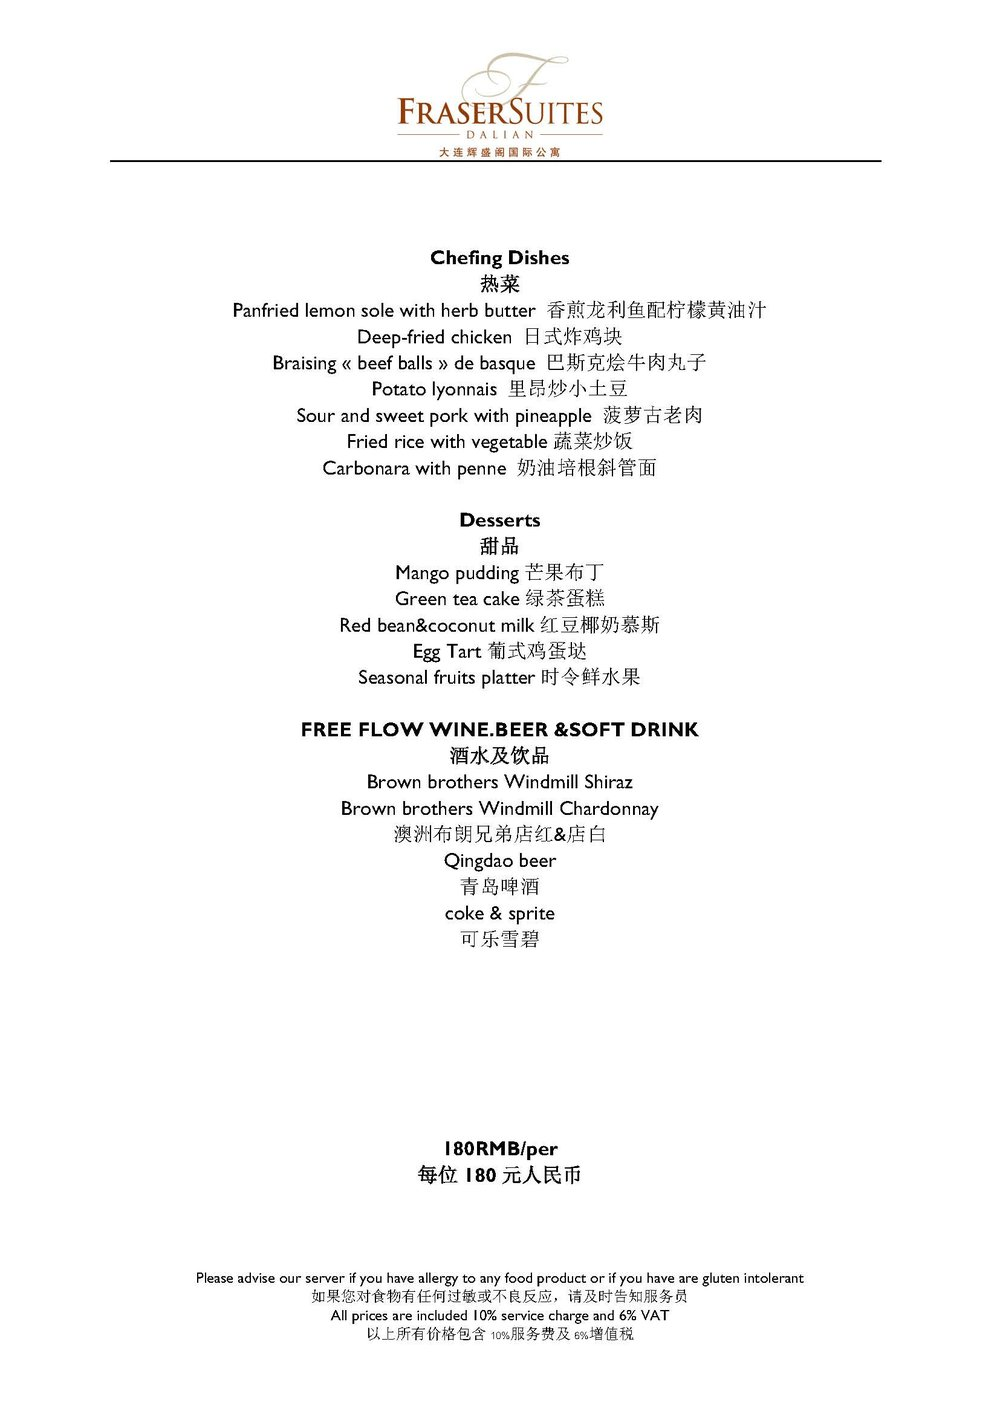 Dinner Buffet Menu 180RMB 1 JULY 2018(1)_页面_2.jpg